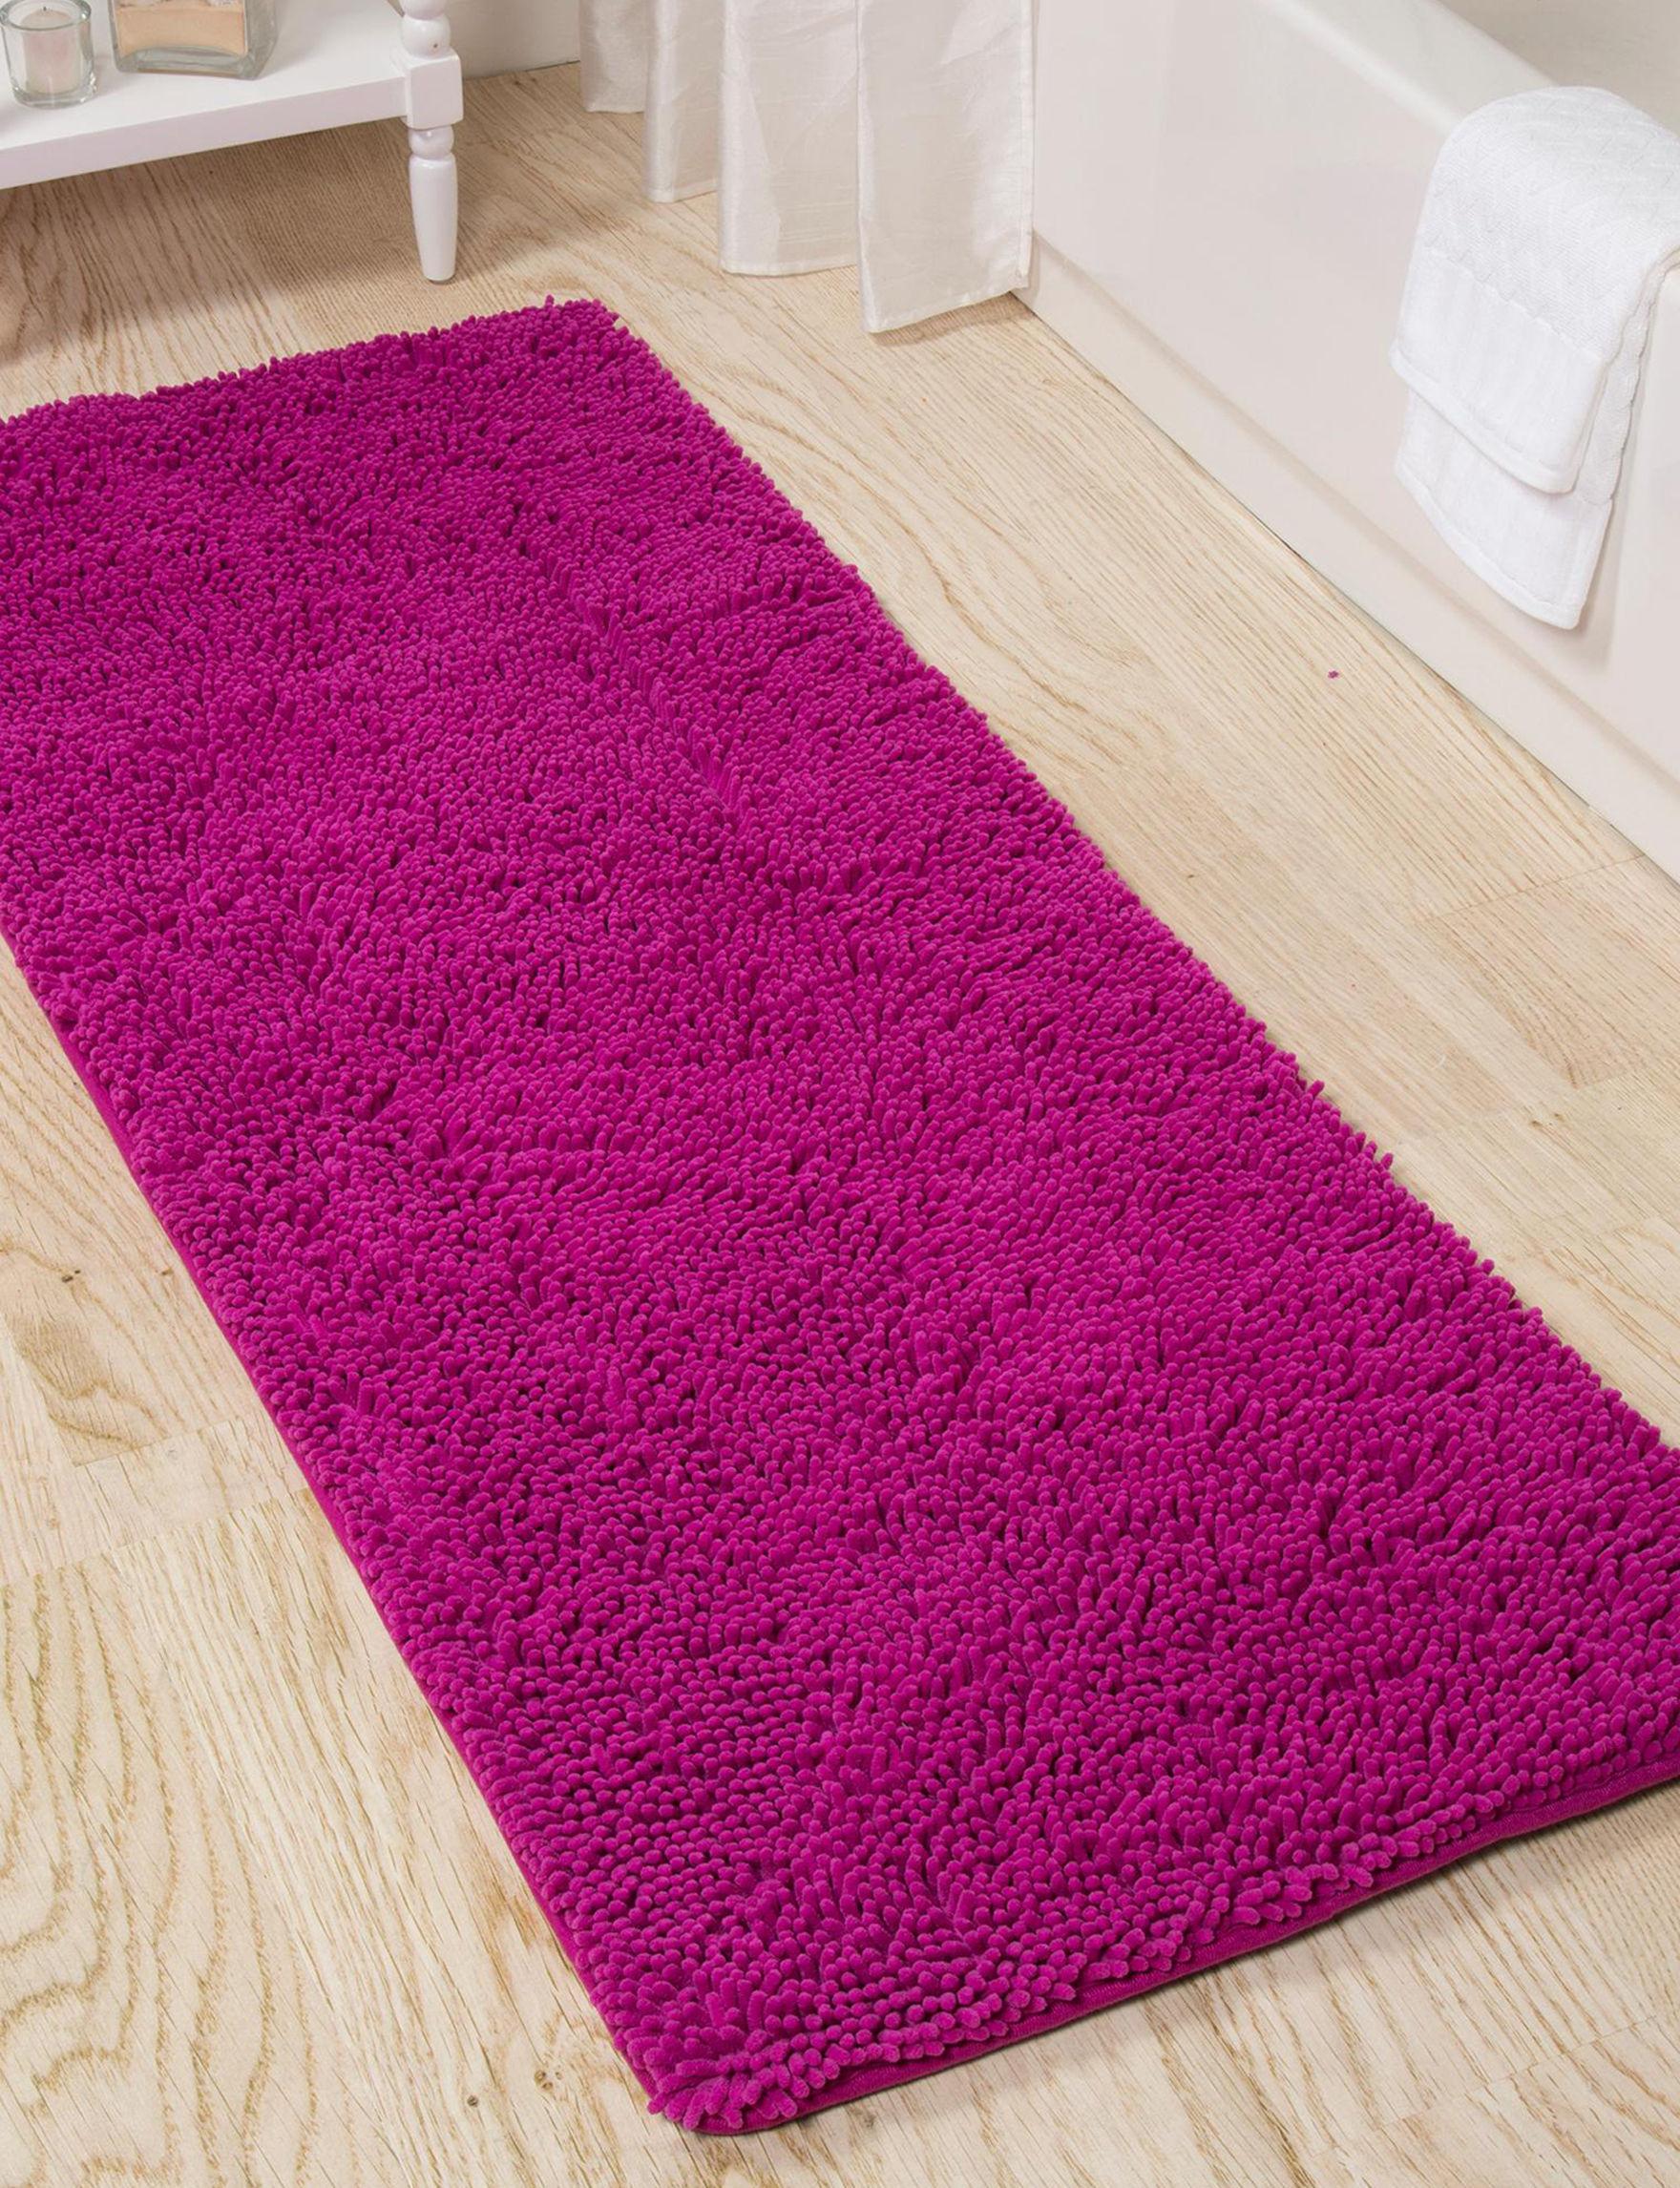 Lavish Home Pink Bath Rugs & Mats